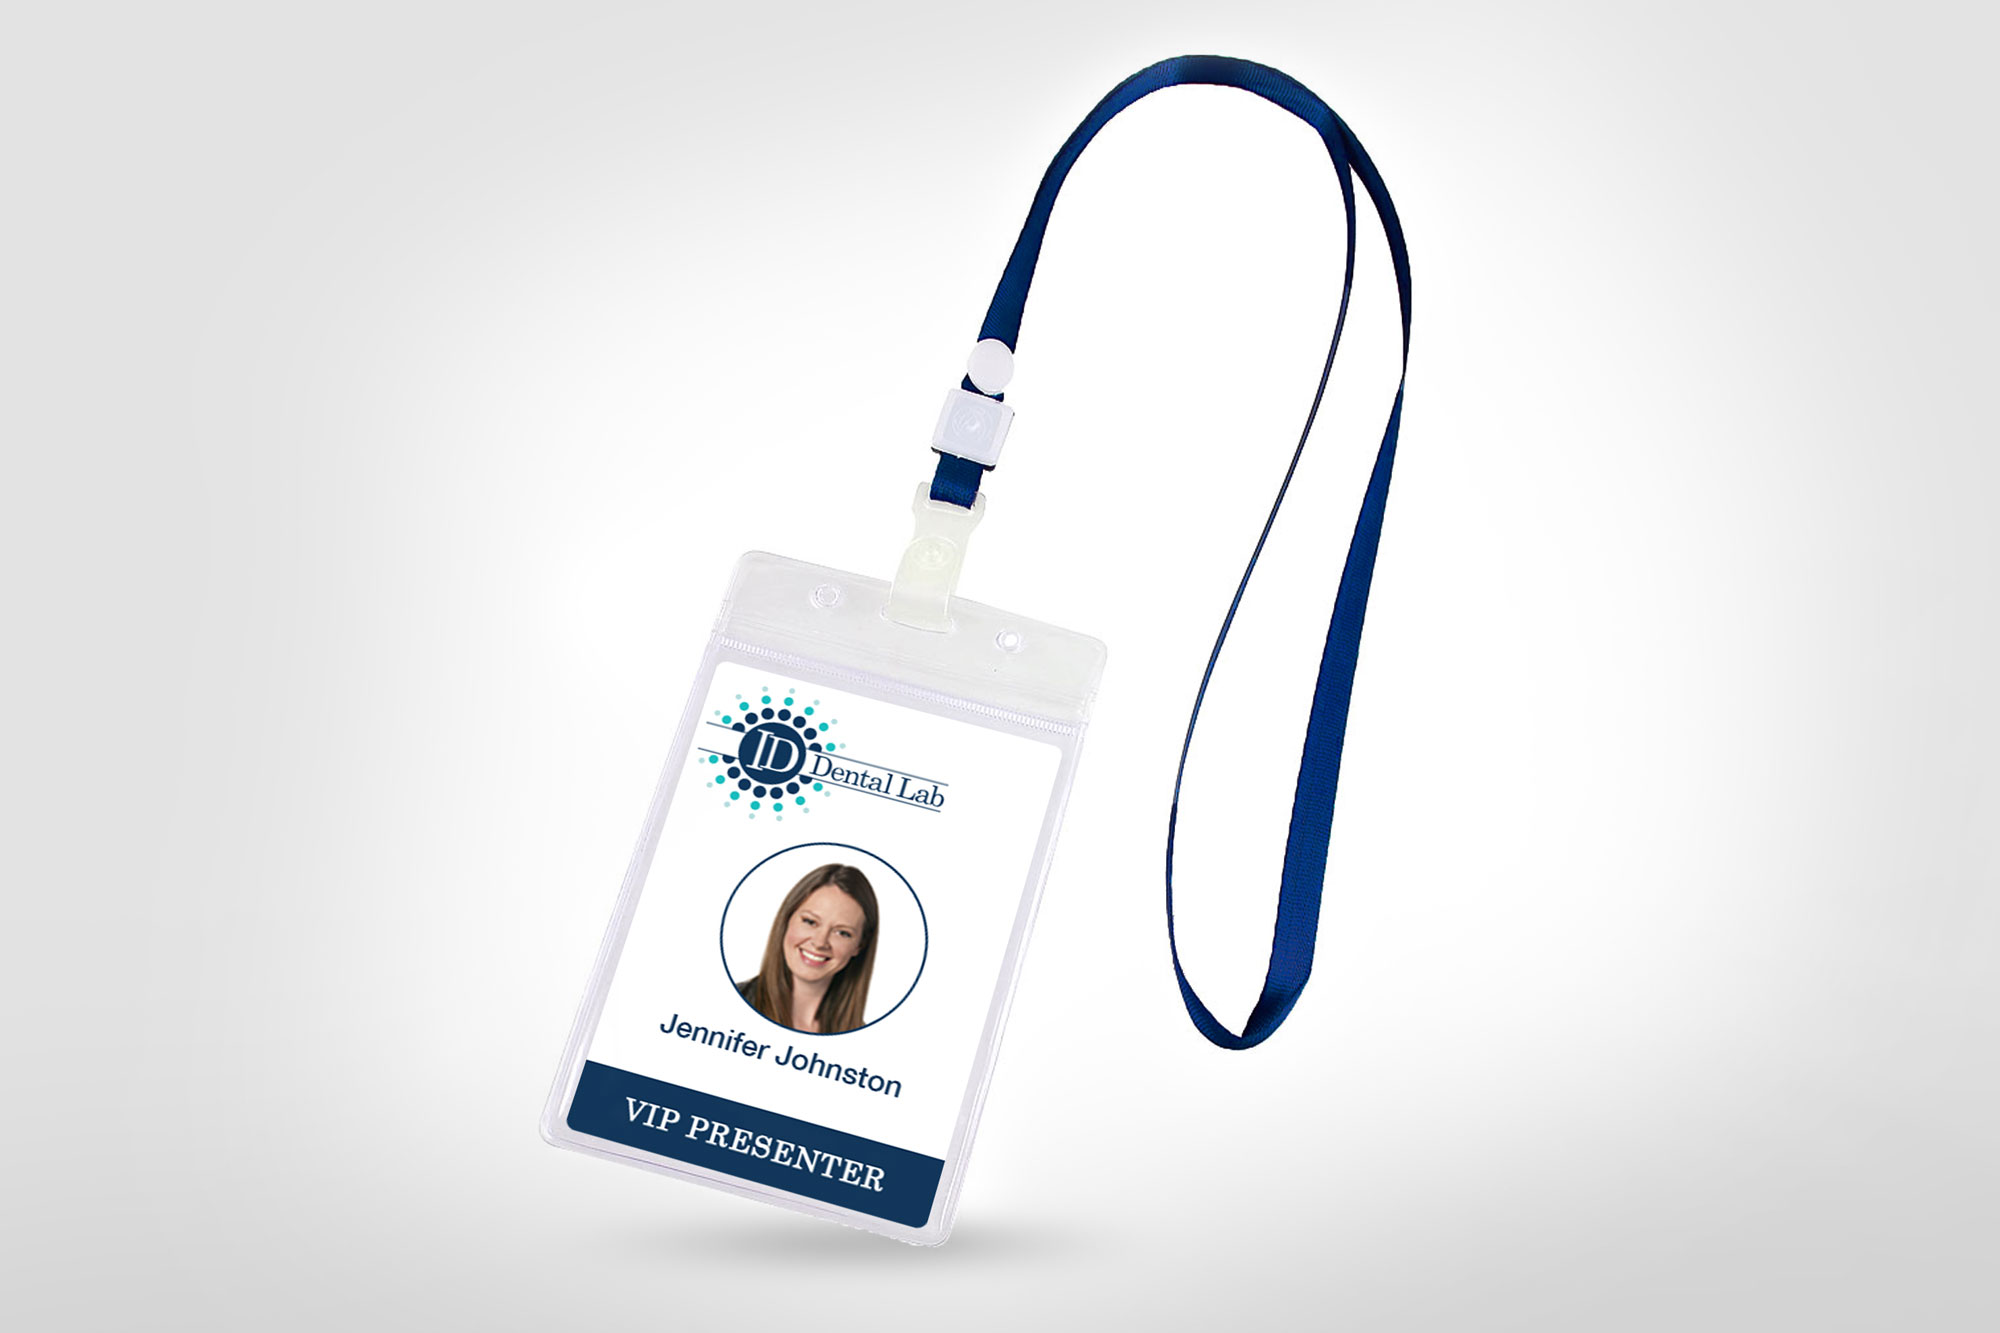 ID Dental Laboratory Name Badge Example